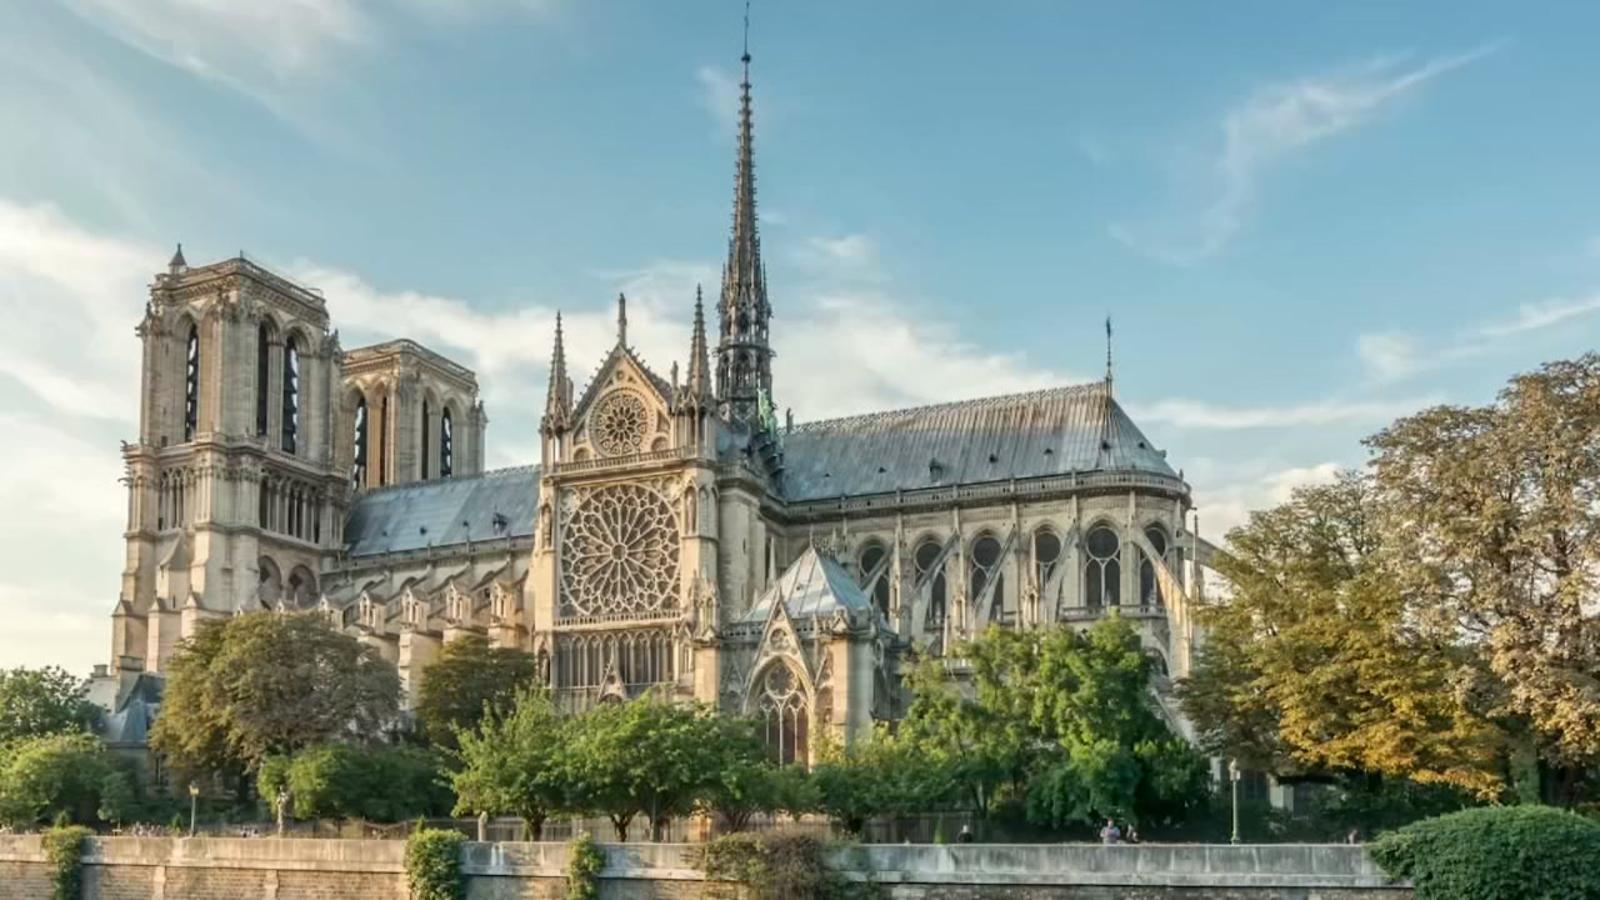 catedrala notre-dame de paris incendiu in flacari inainte